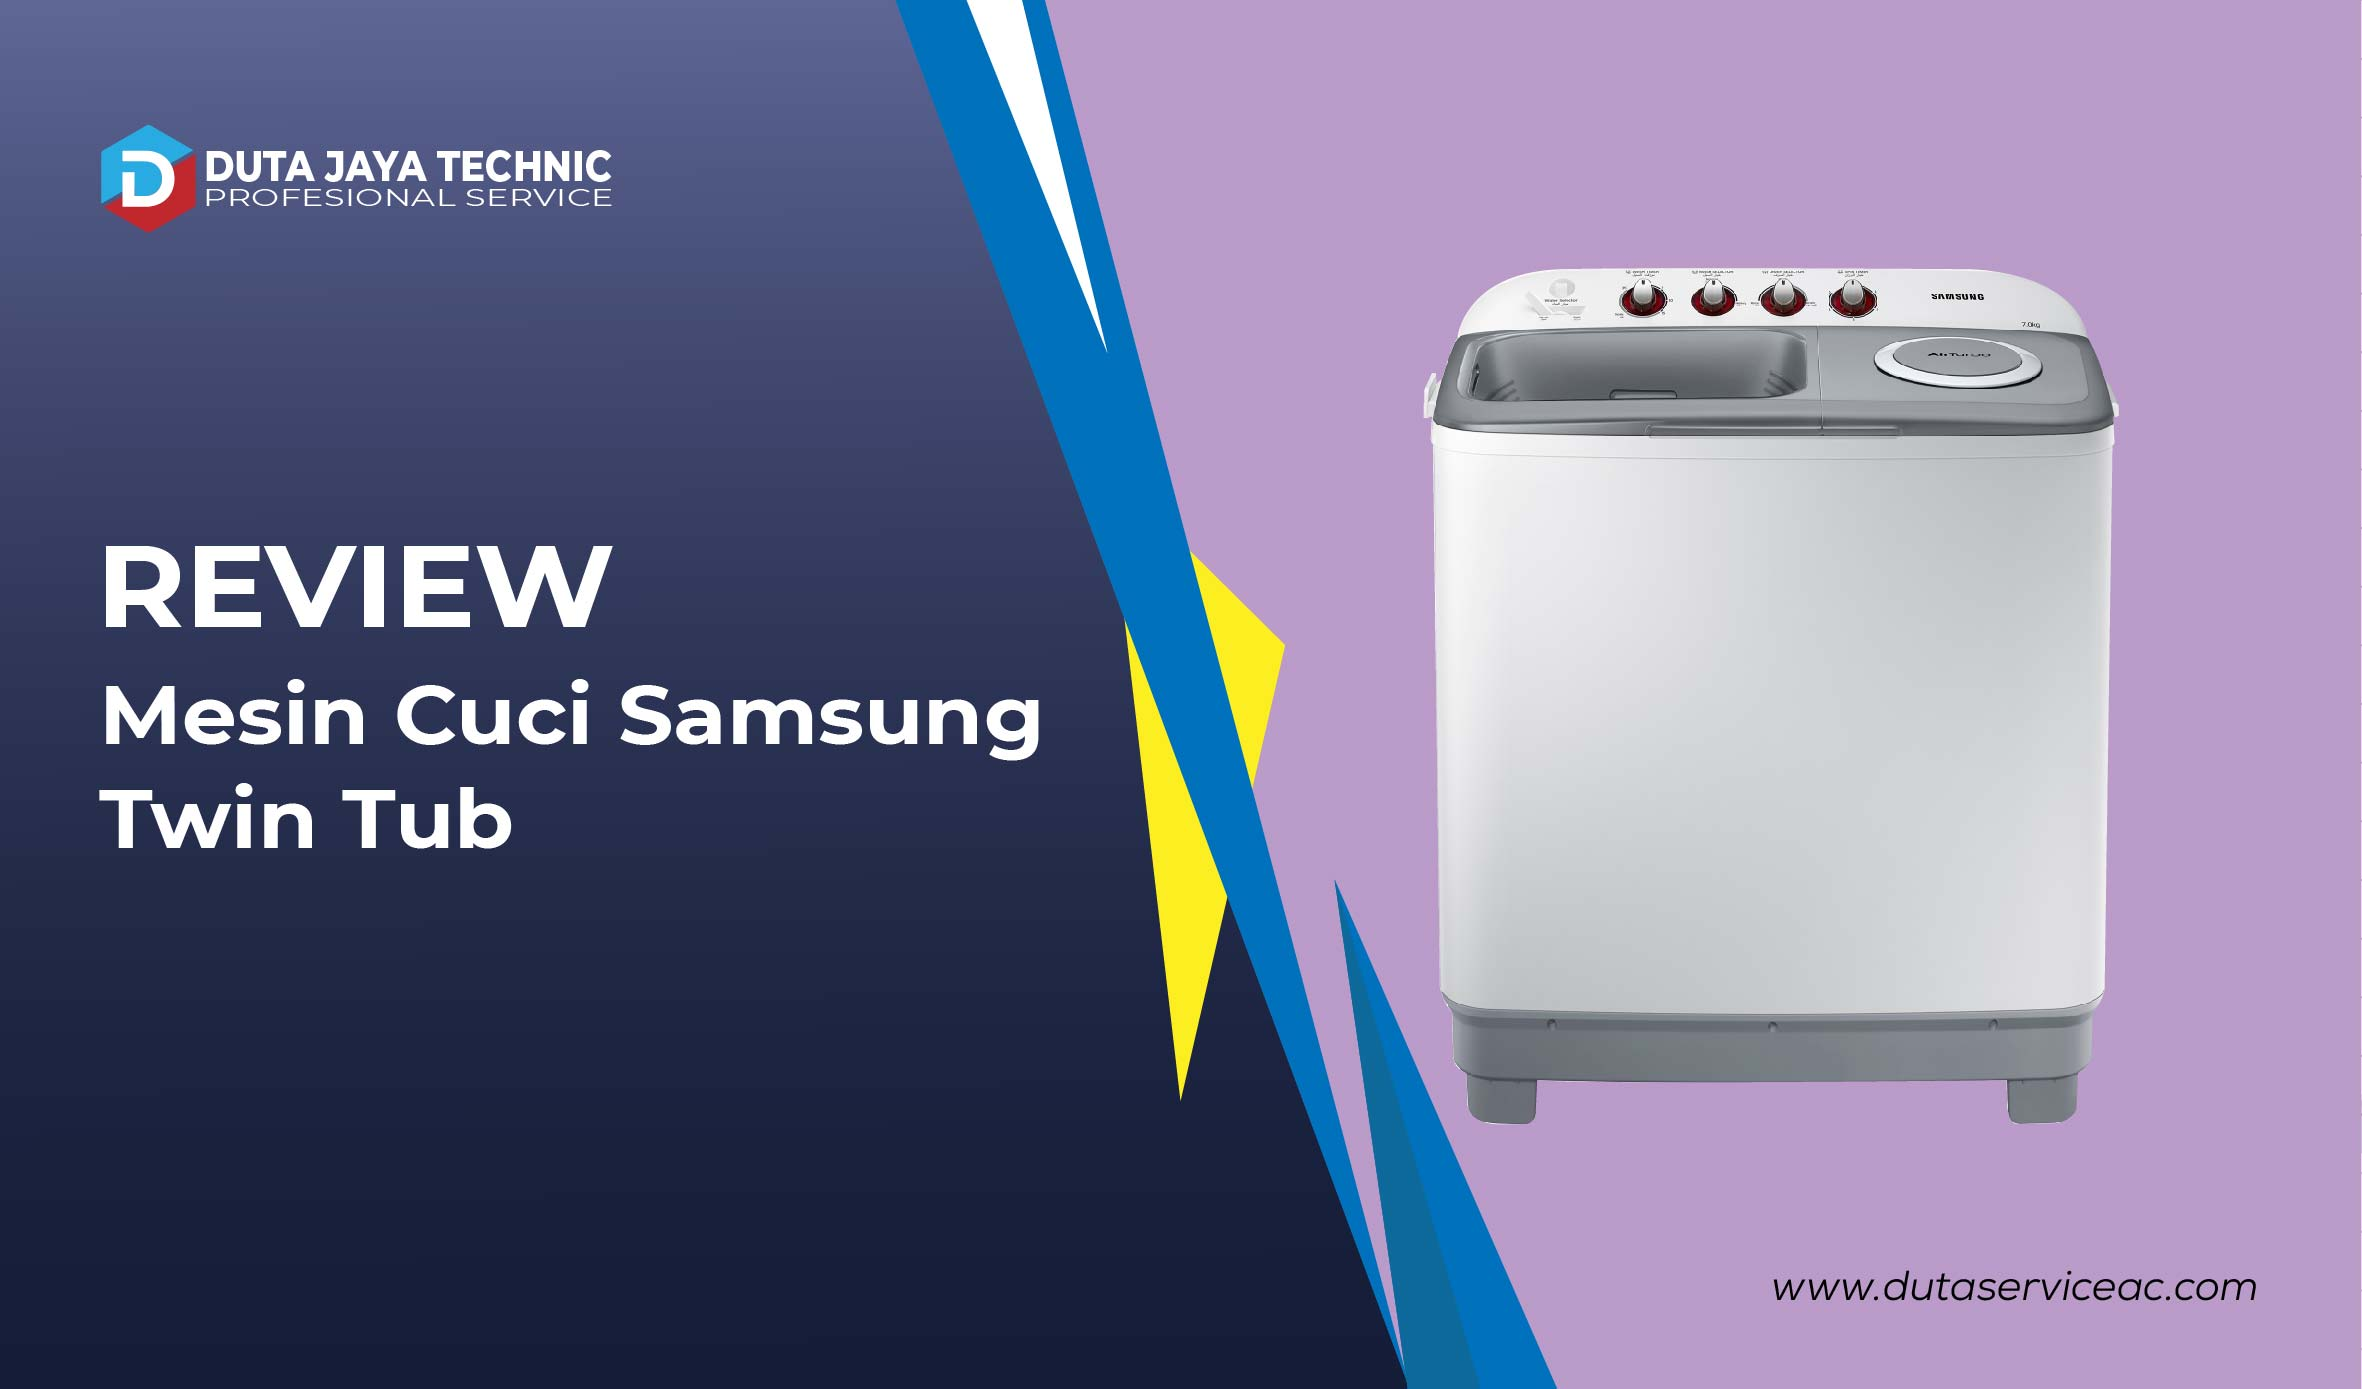 review mesin cuci samsung twin tub